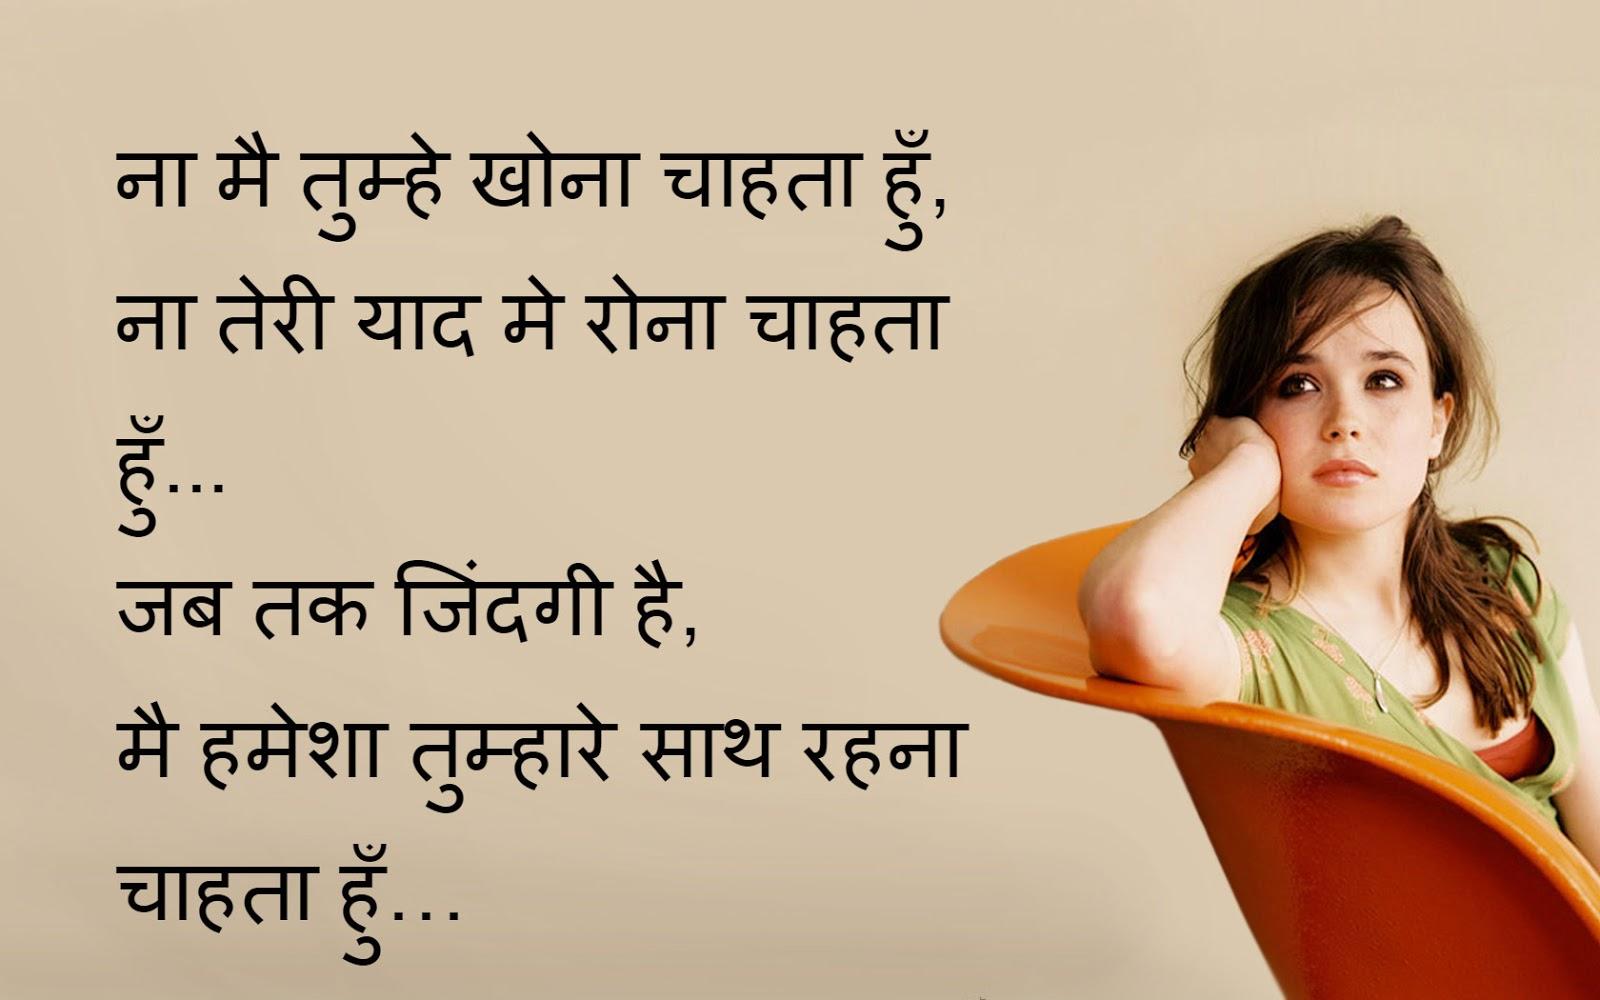 Emotional Deep Love Kiss Shayari for Girlfriend With Image in Hindi